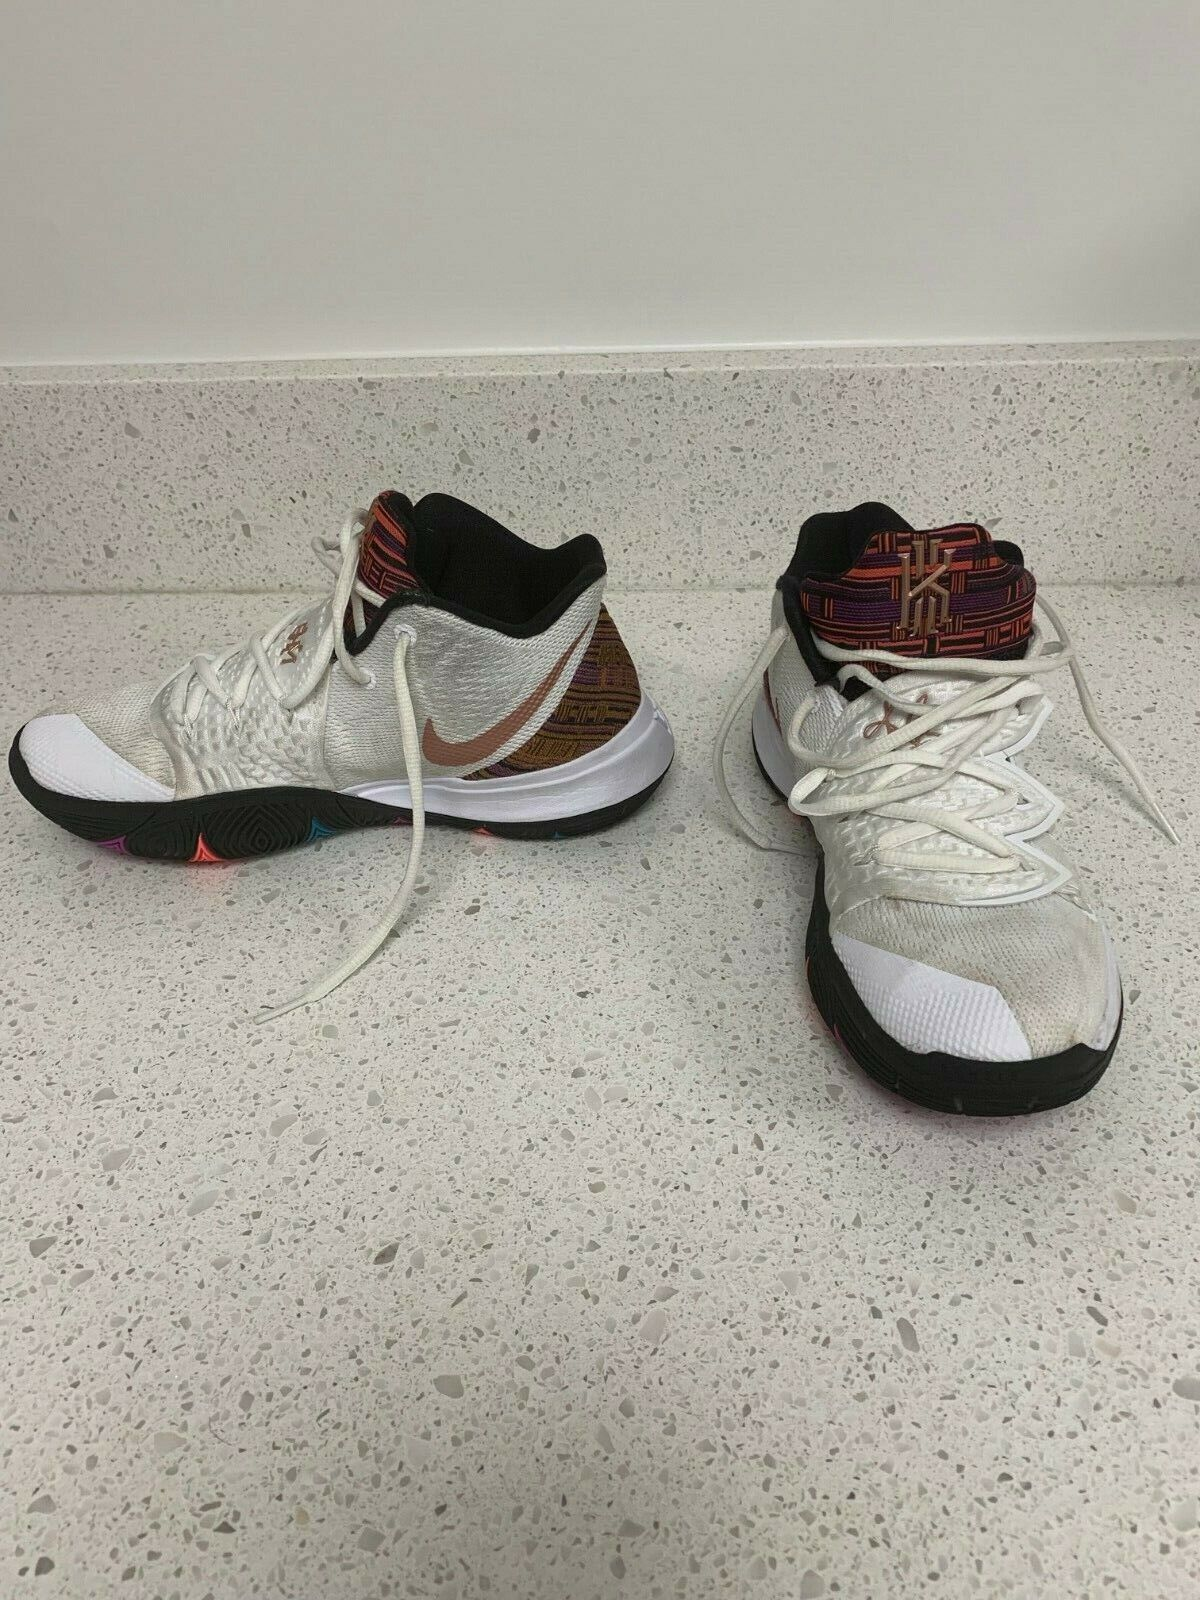 Nike Kyrie 5 BHM BLACK HISTORY MONTH